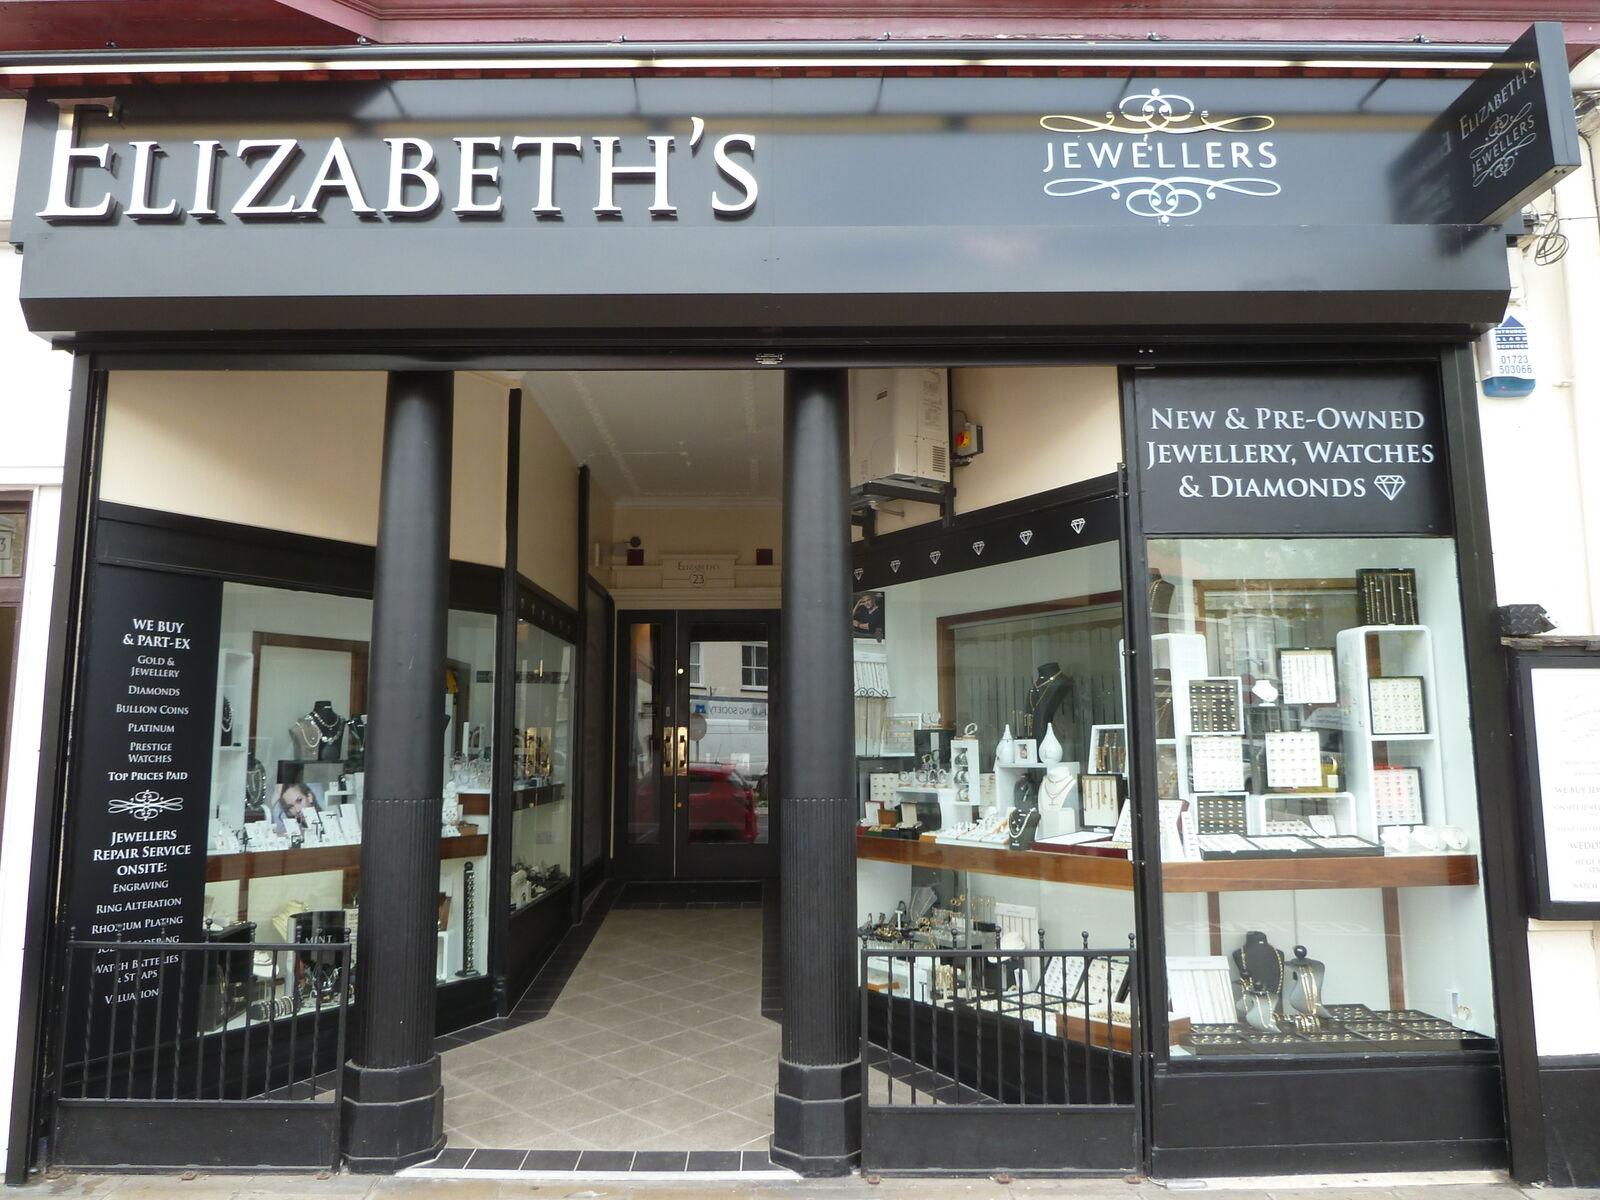 Elizabeth's Ltd